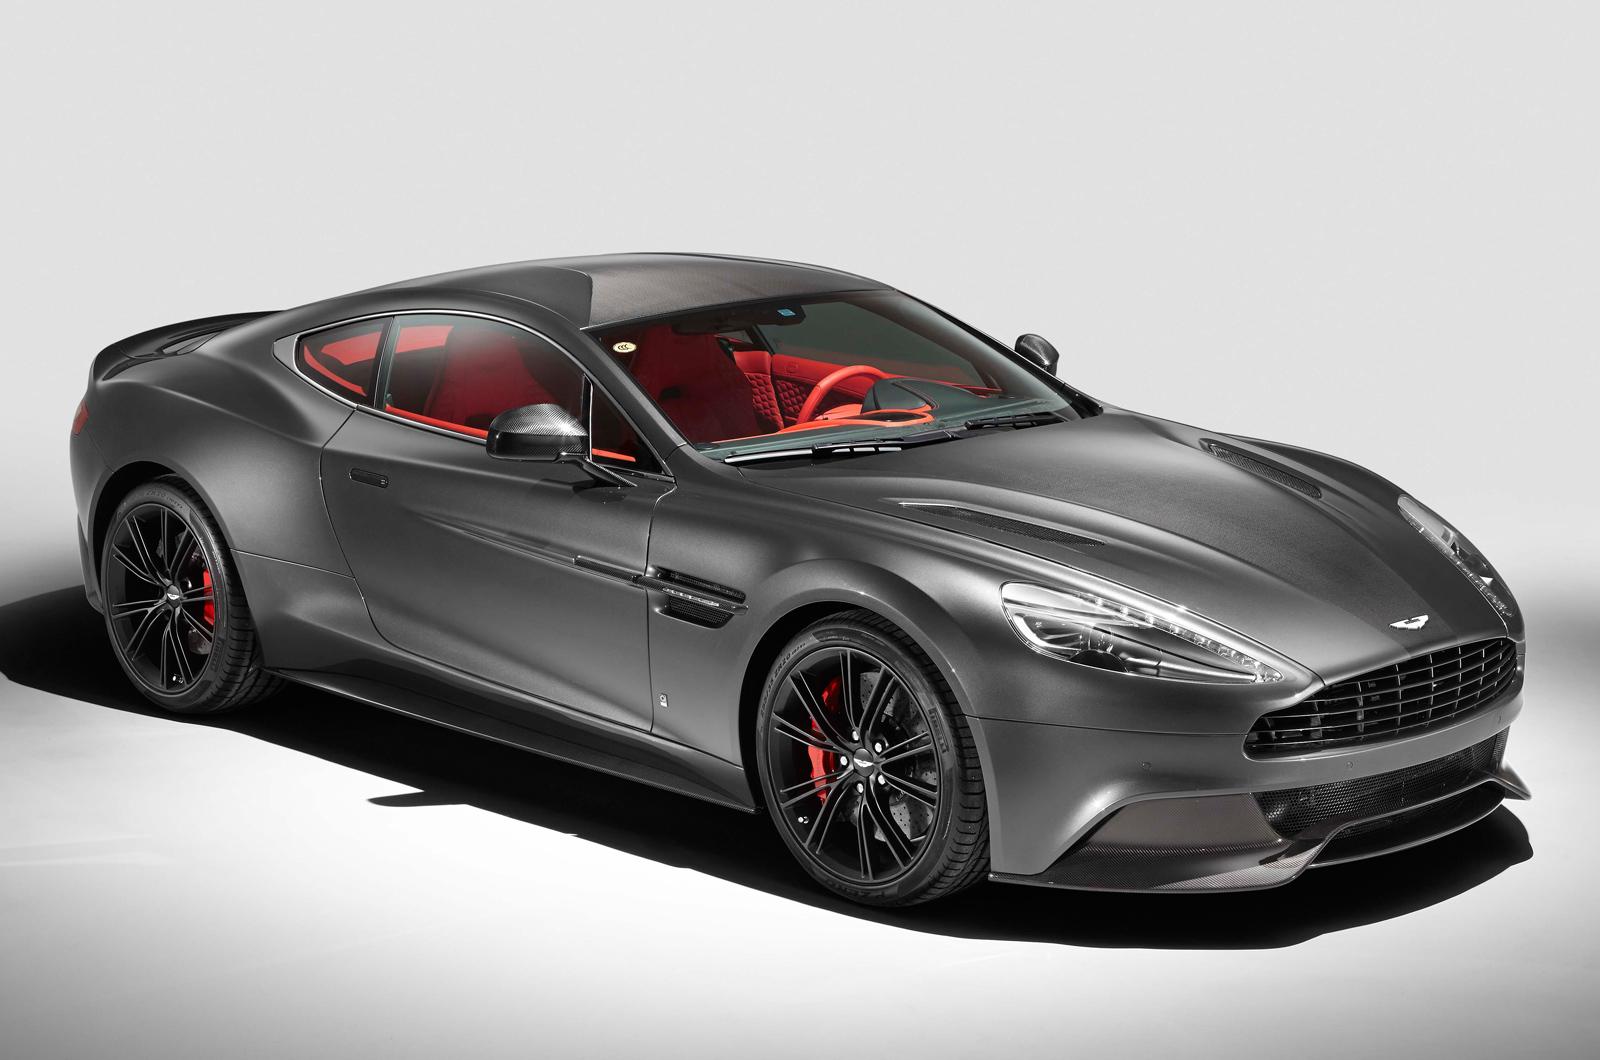 2012 - [Aston Martin] Vanquish [310] - Page 6 Aston-vanquish-q-1-11